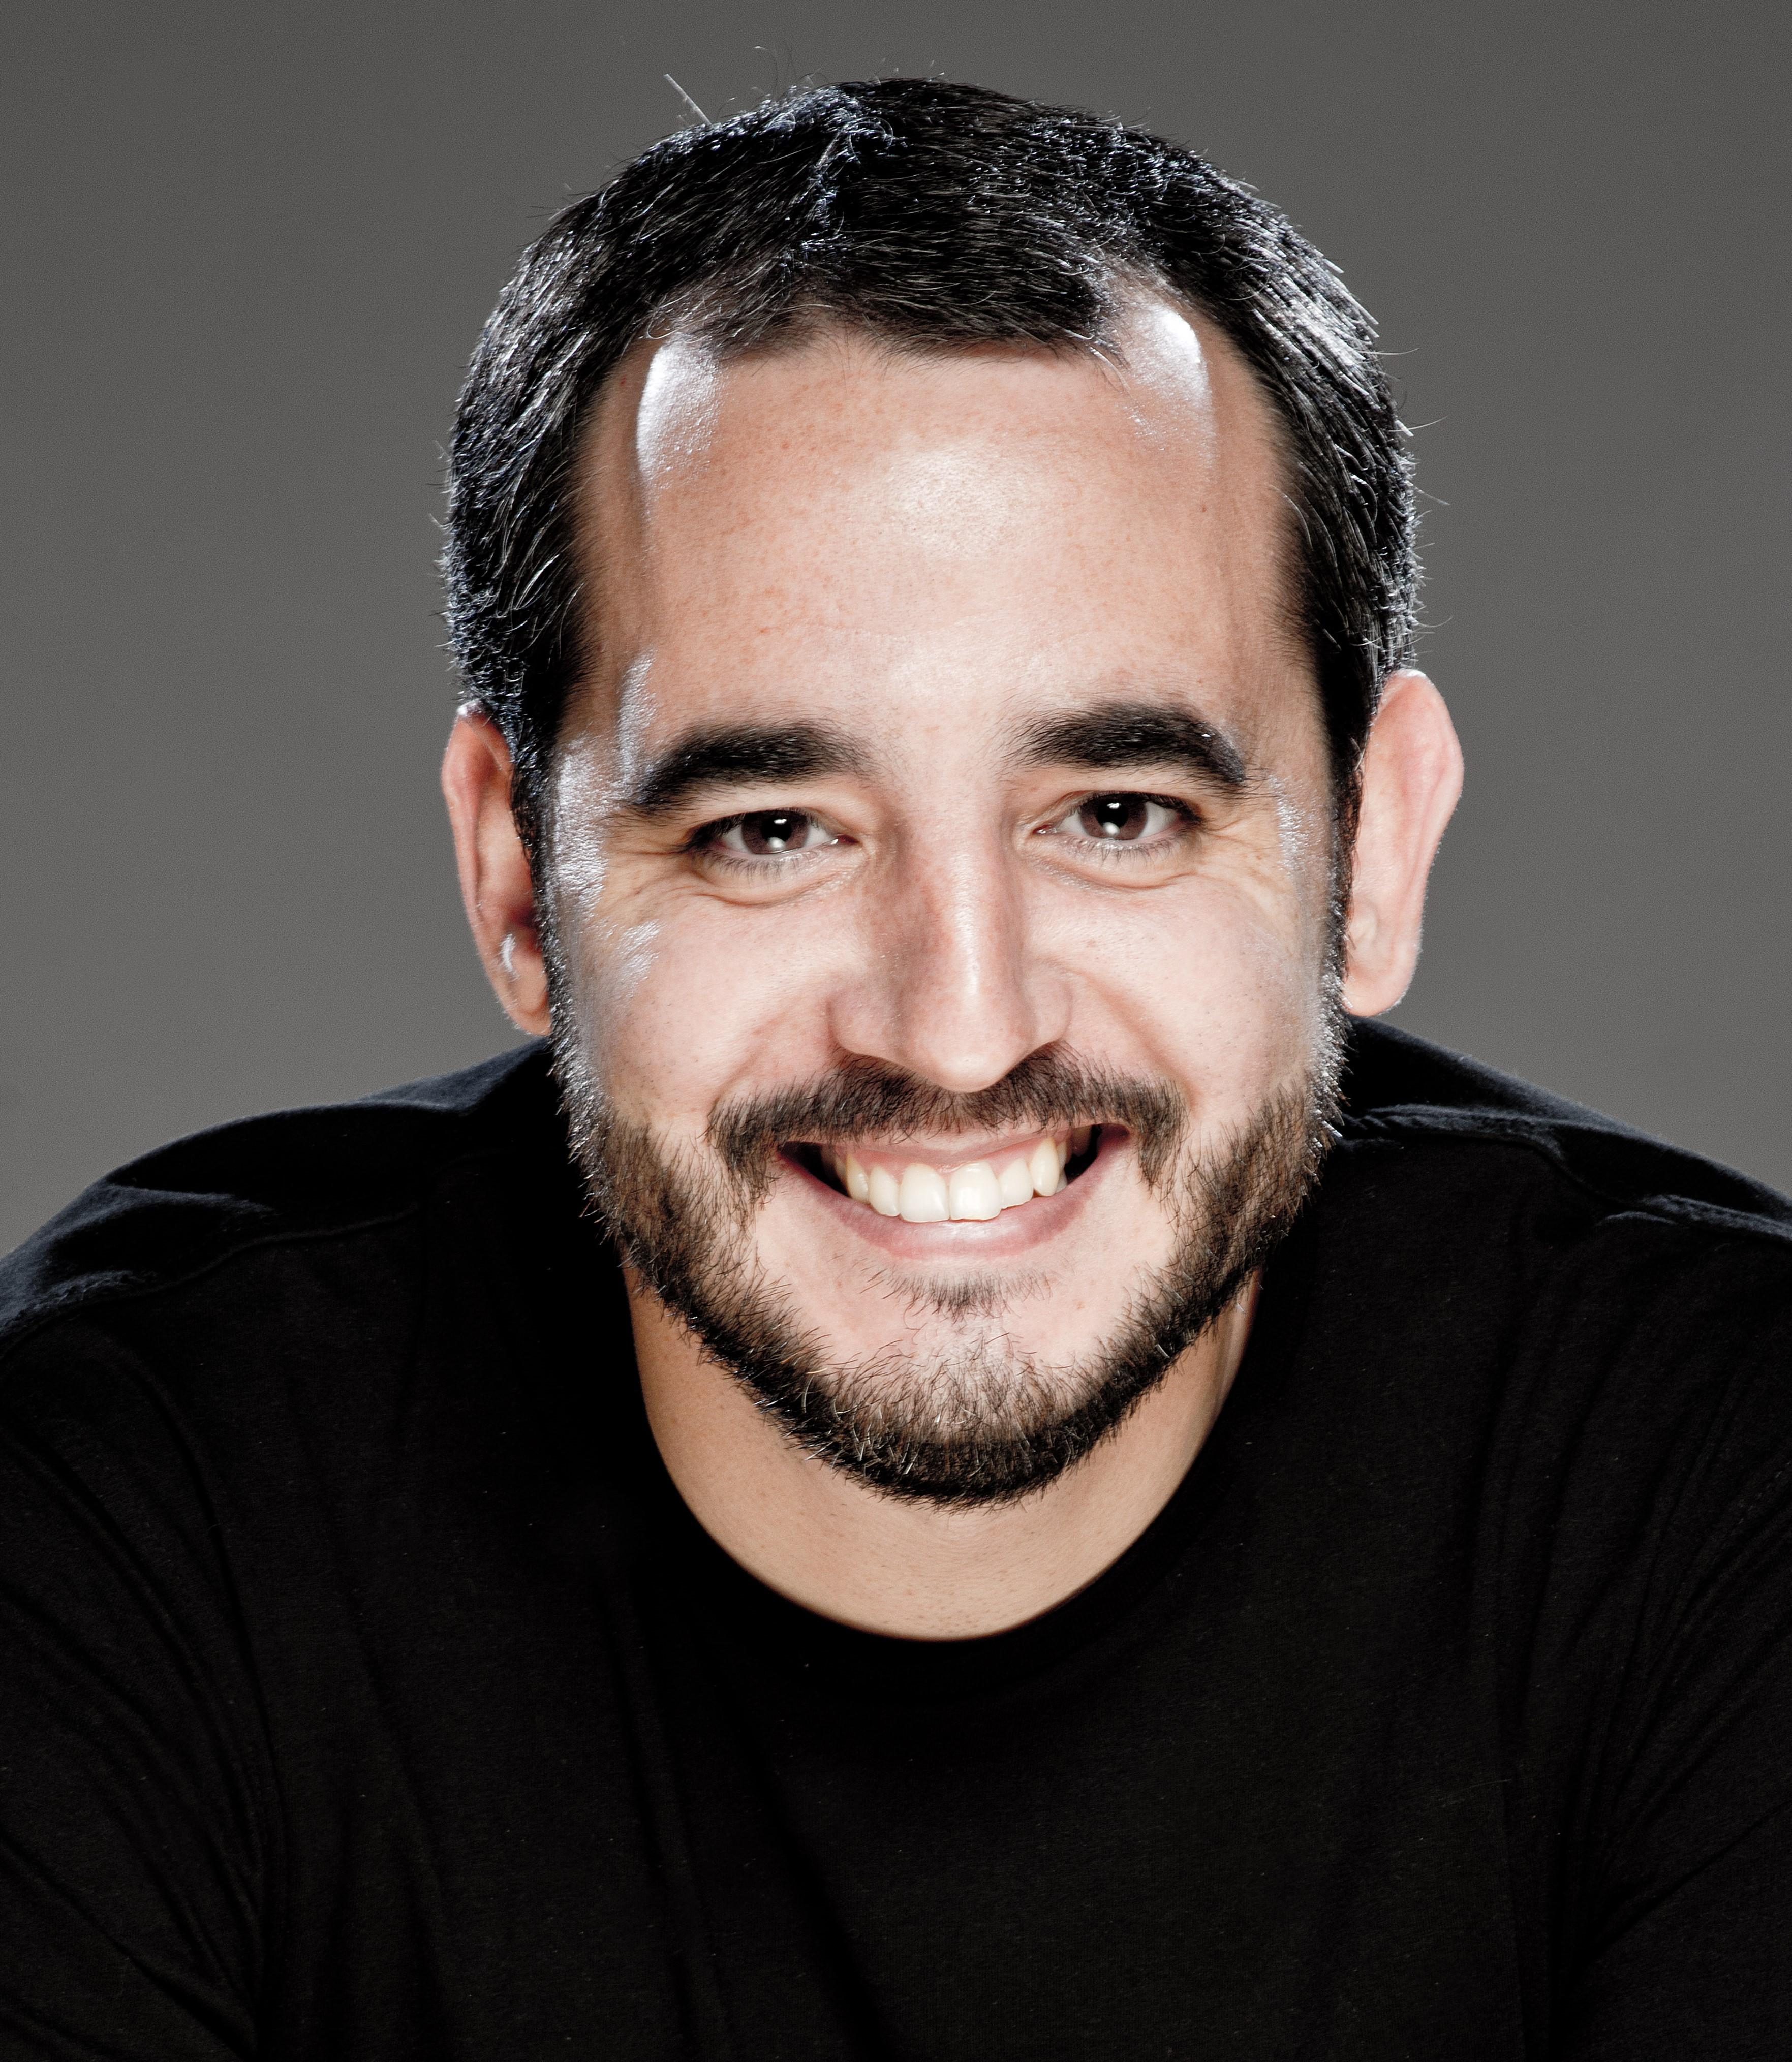 Antonio Rojano